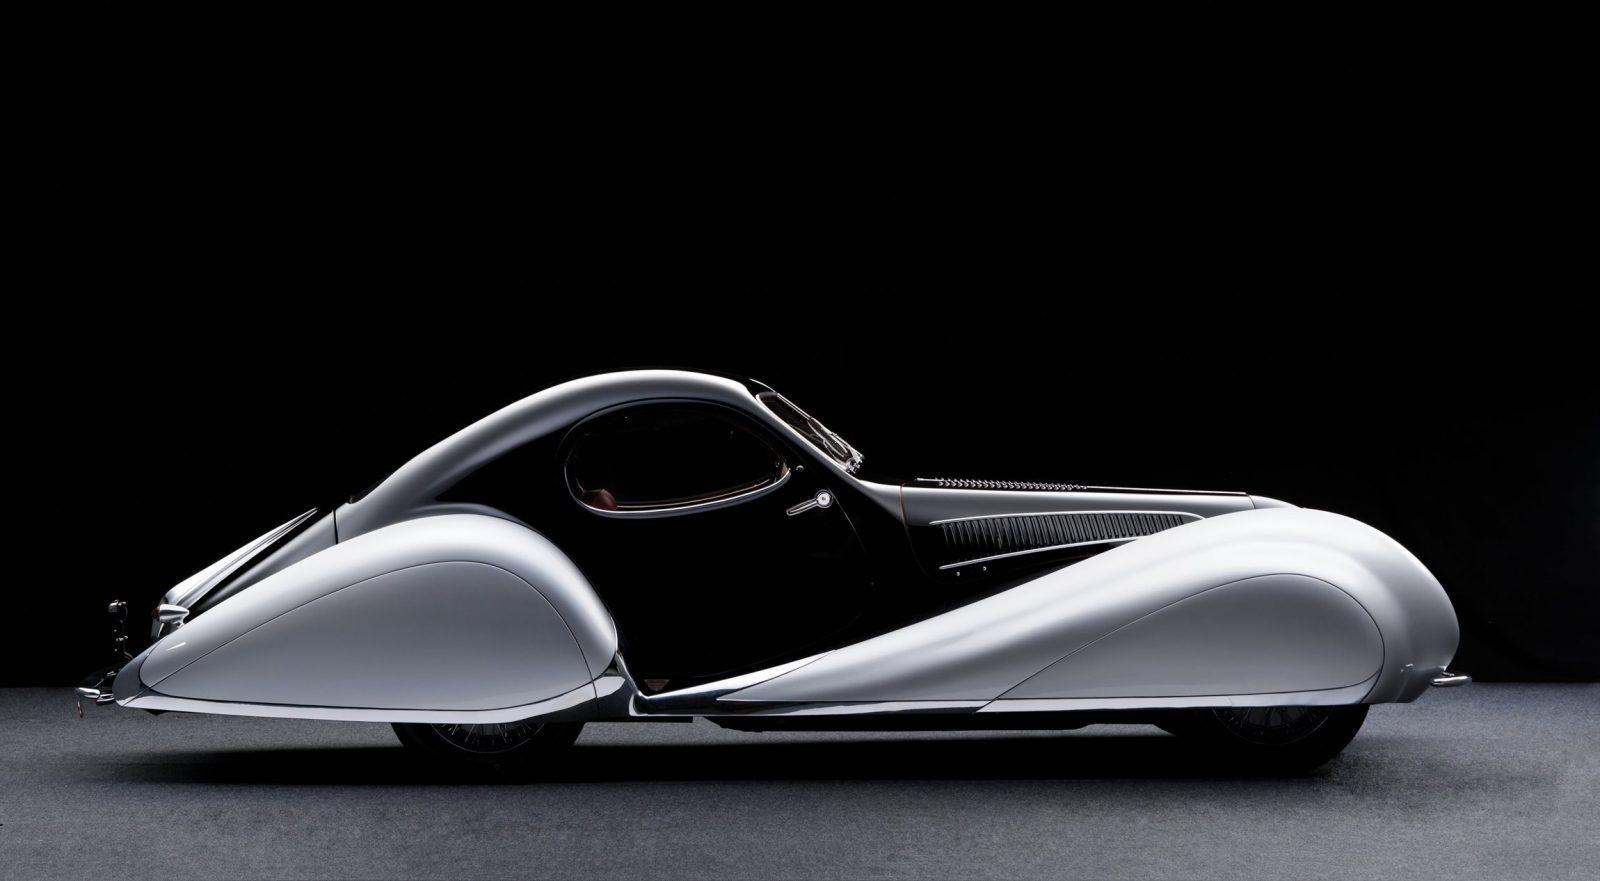 1937 Talbot-Lago T150-C SS 19-3